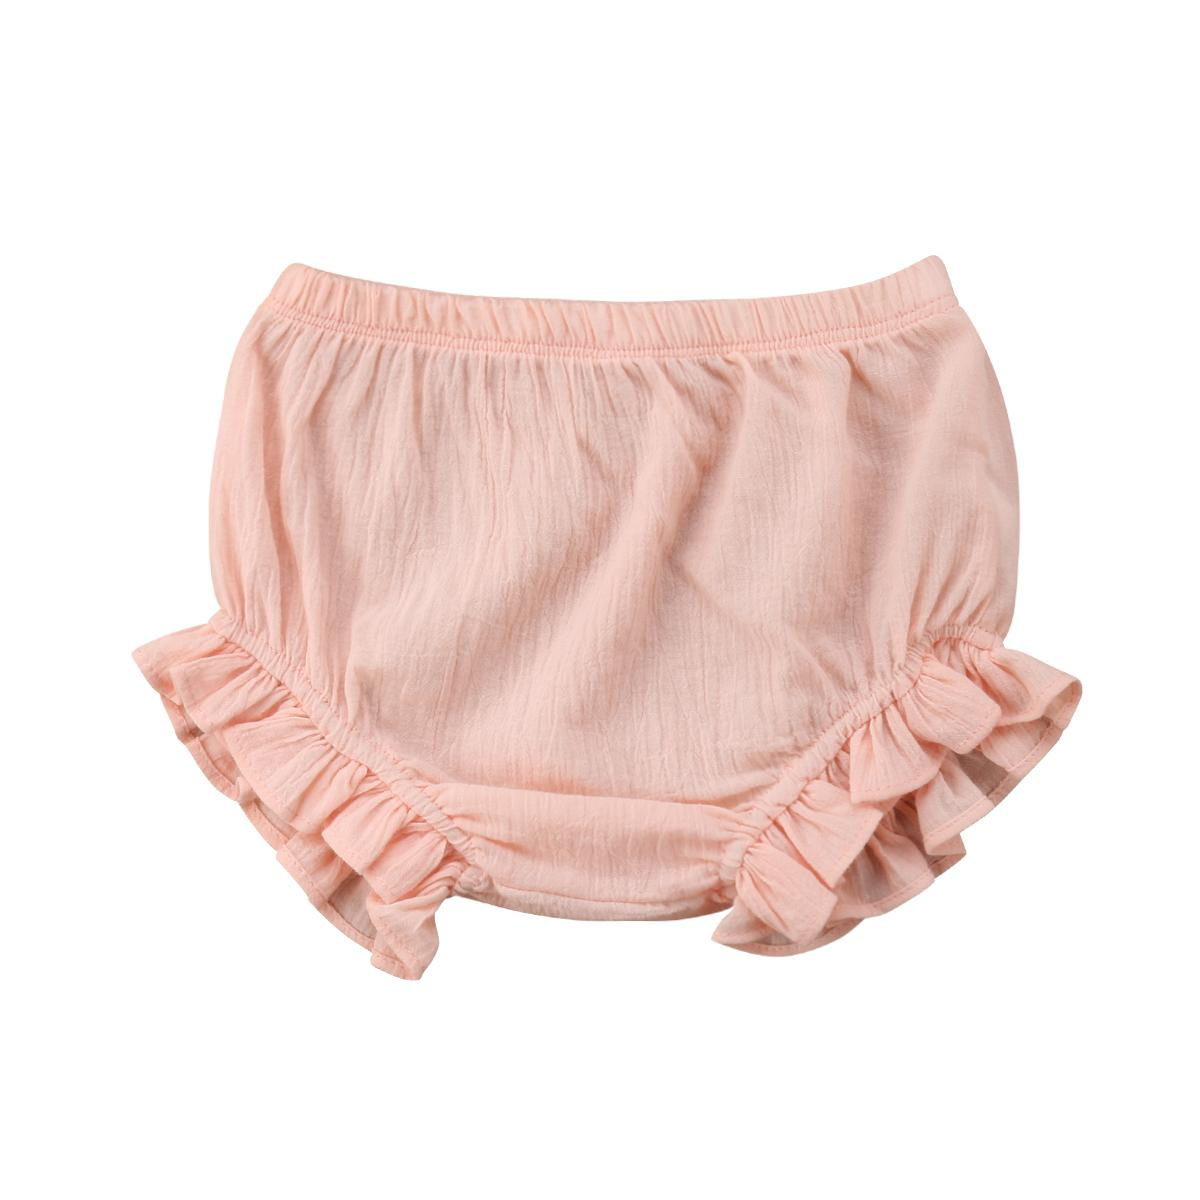 Toddler Infant Baby Boy Girl Kid Tassel Pants Shorts Bottoms PP Bloomers Panties Size 1-5T